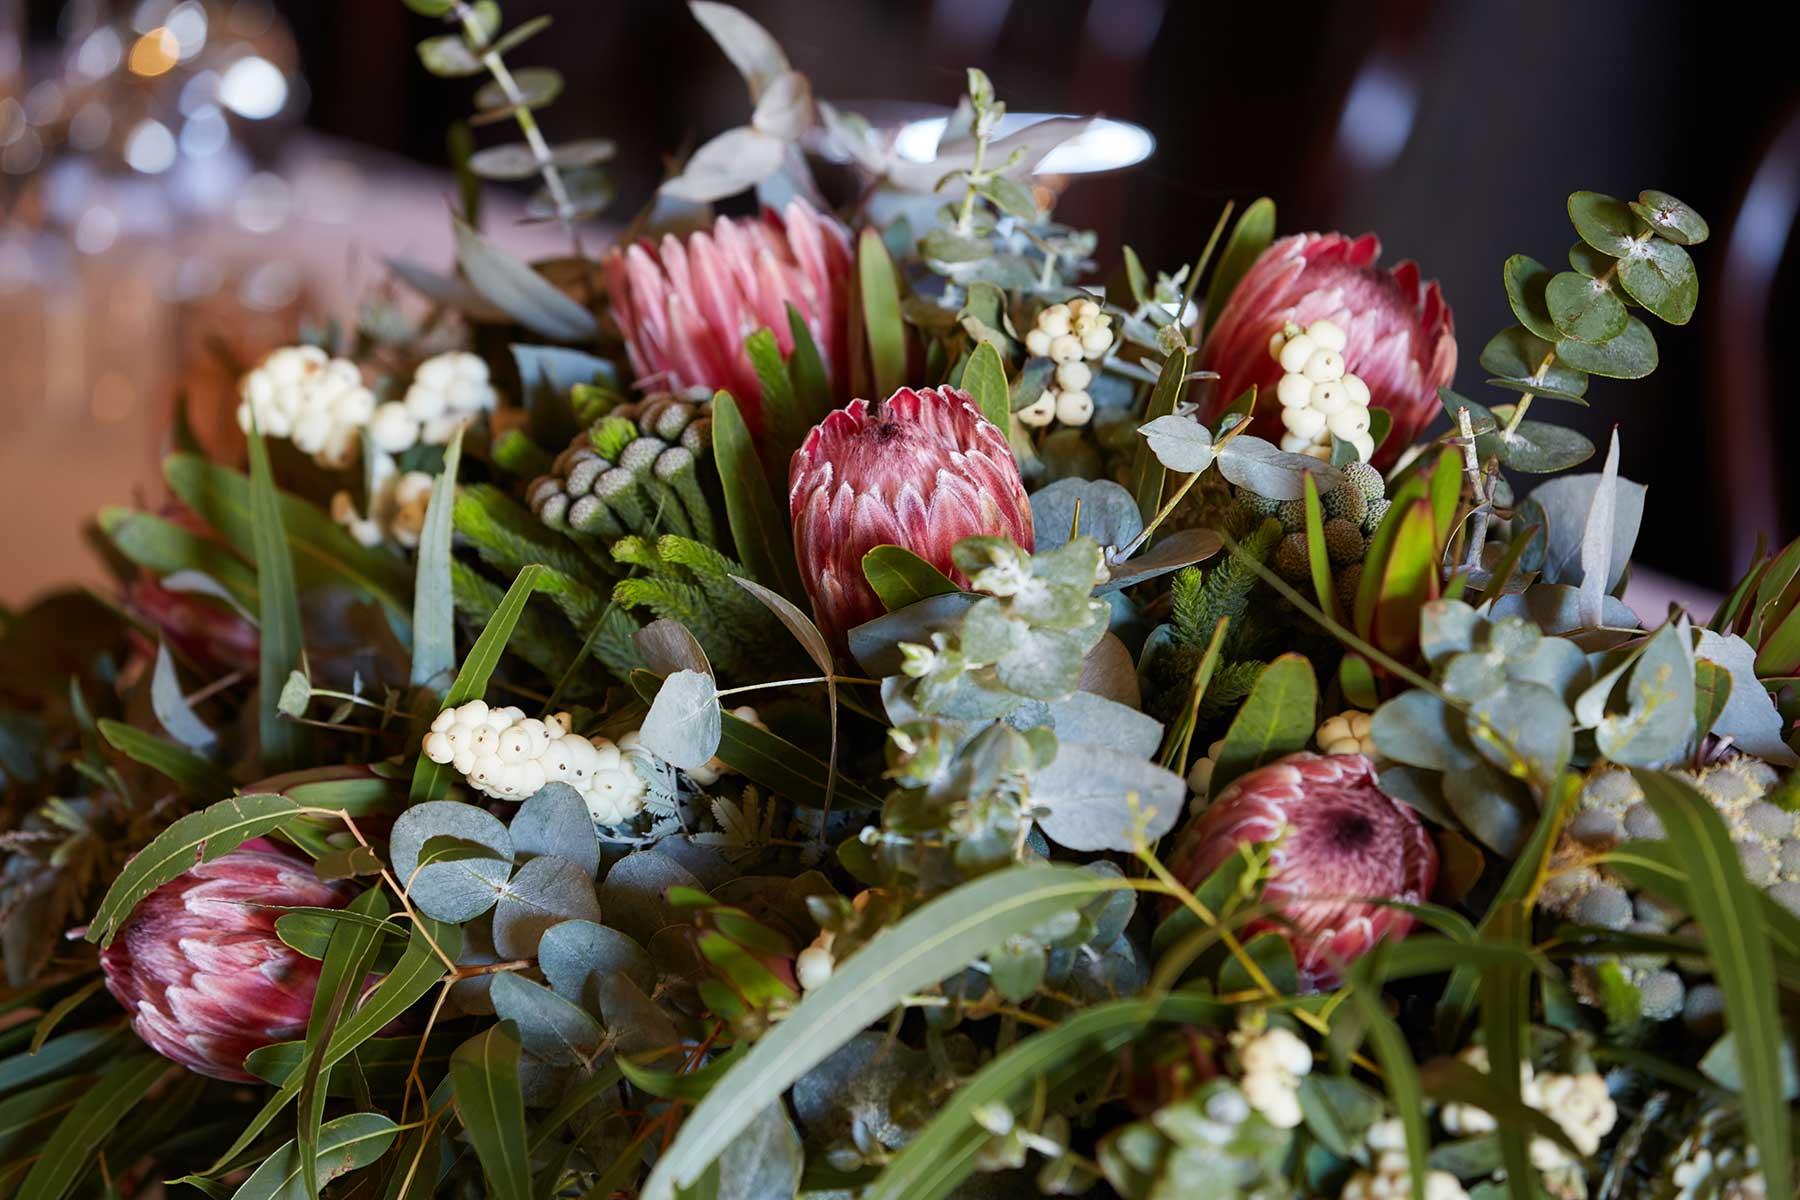 St Leonards WInery Wedding Photography by Melbourne and Albury Wedding Photographer Jason Robins